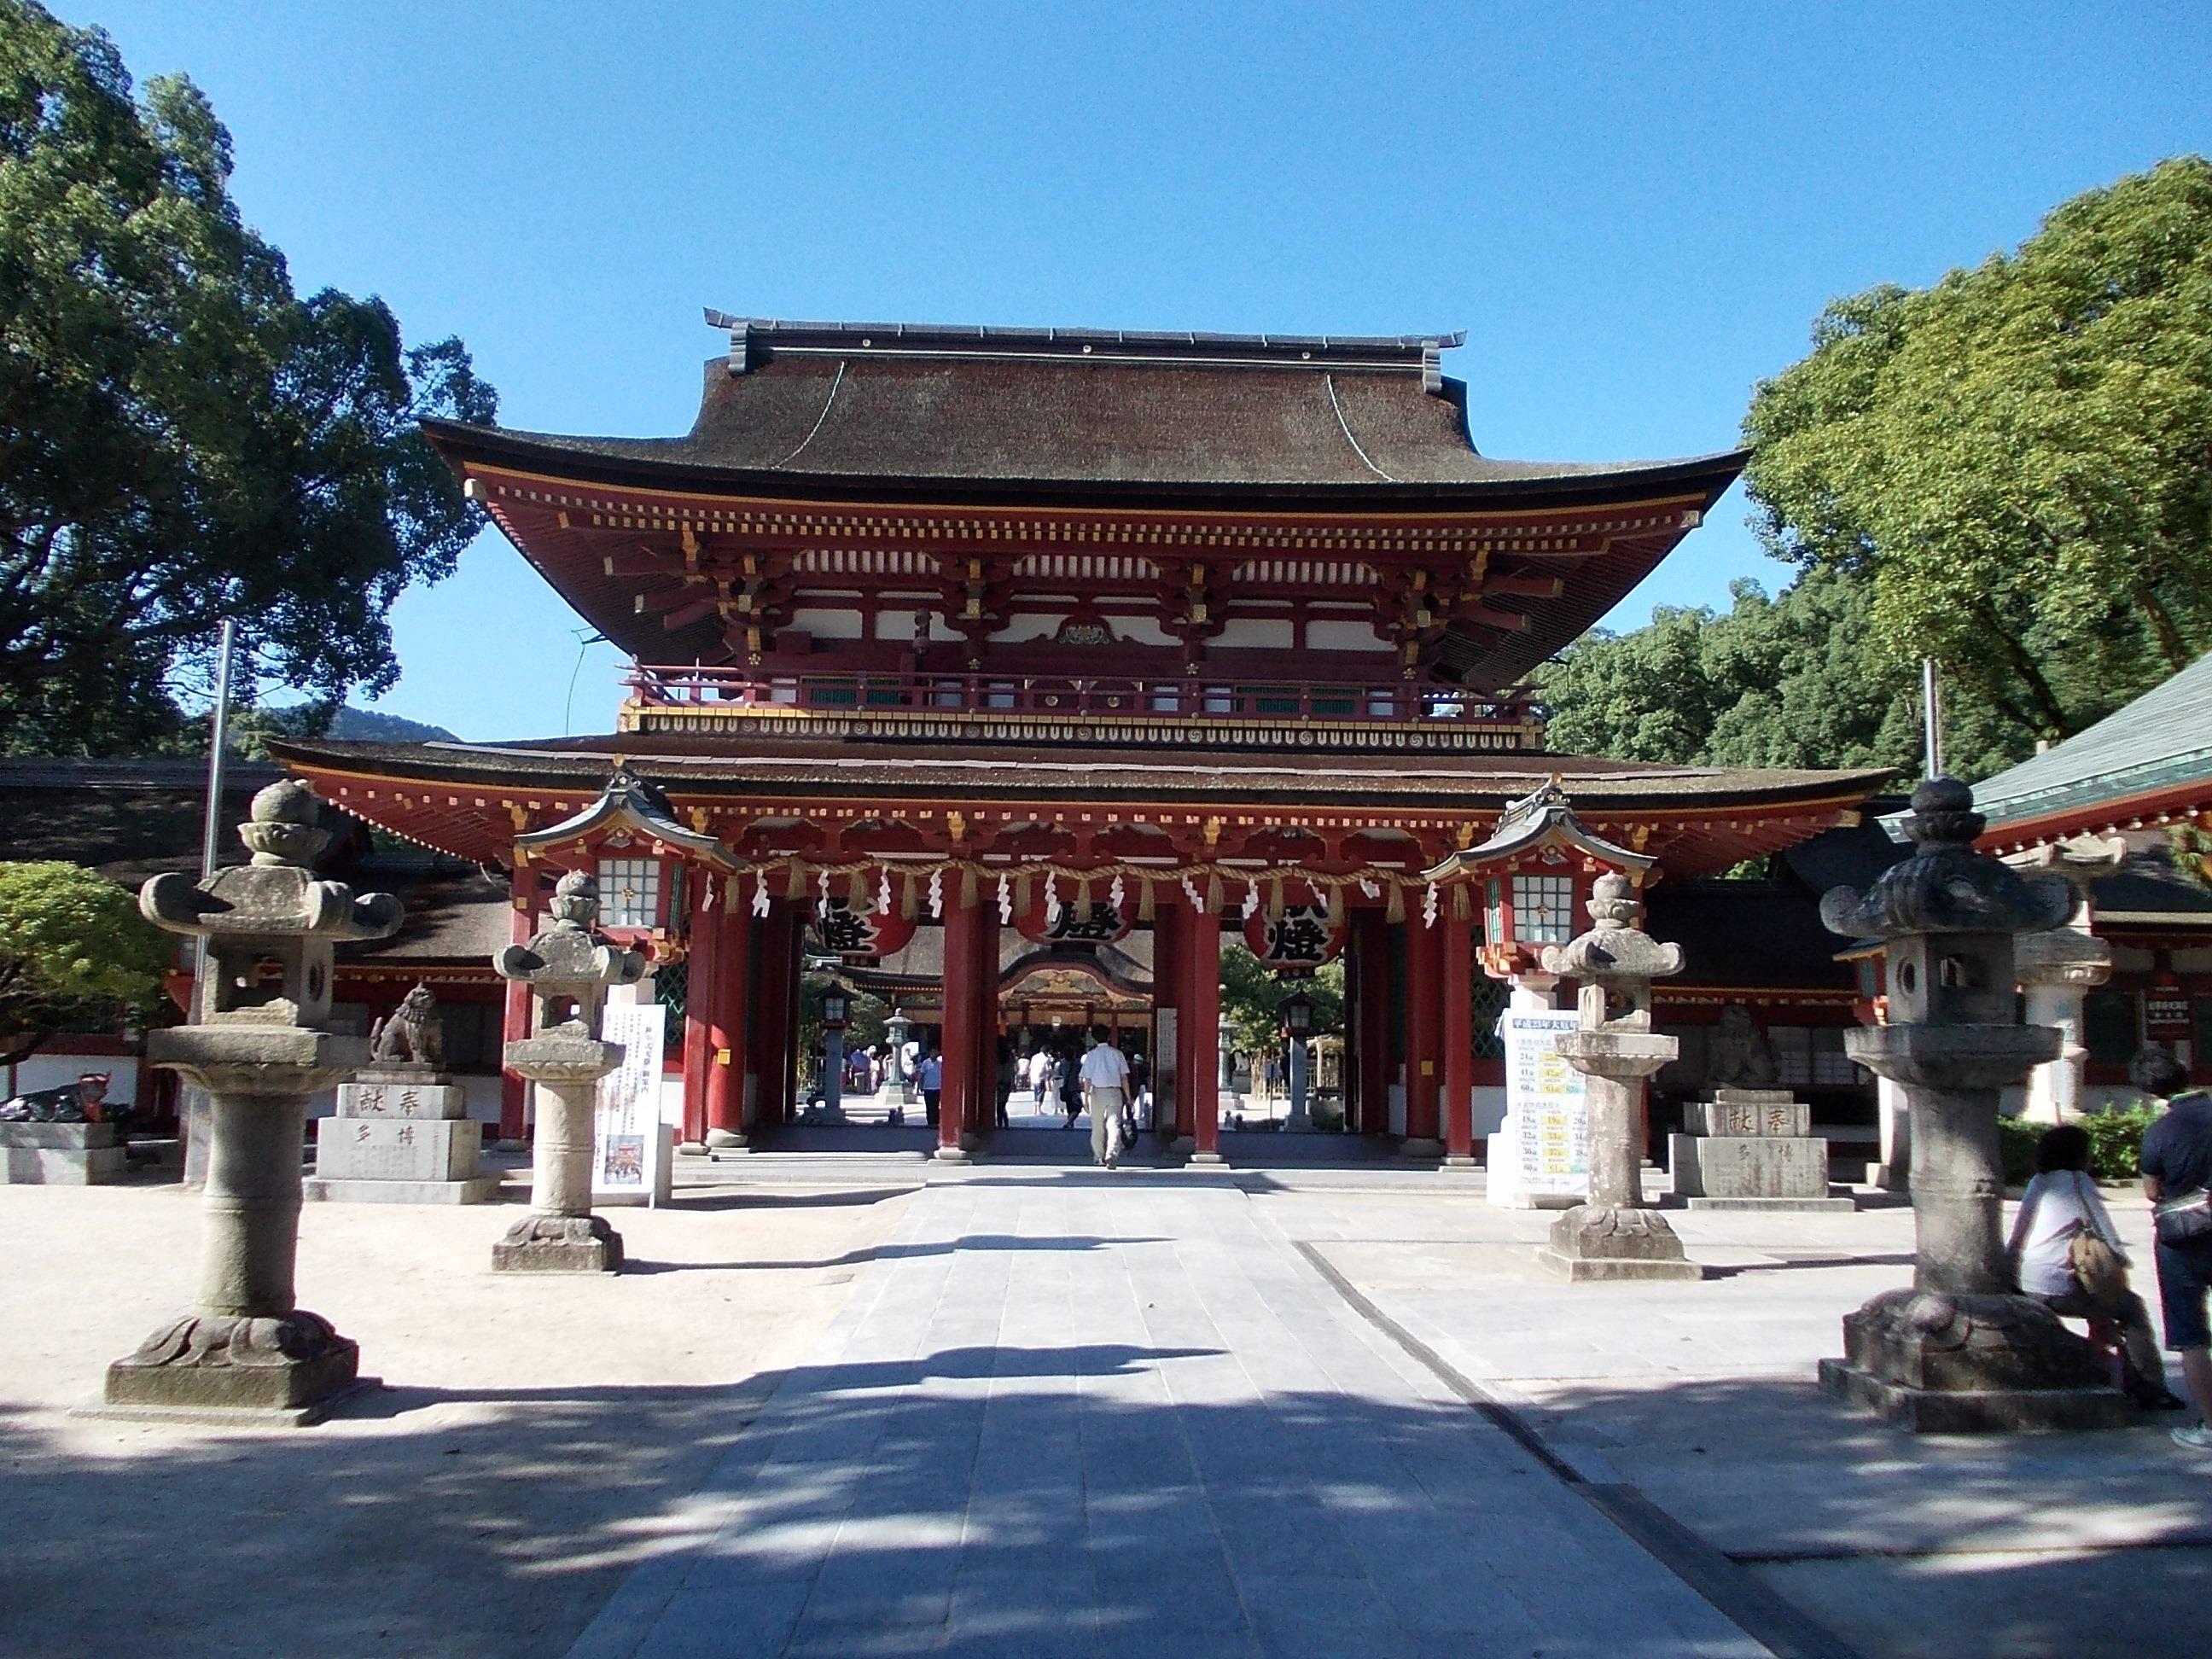 File:Dazaifu Tenmangu 03.jpg